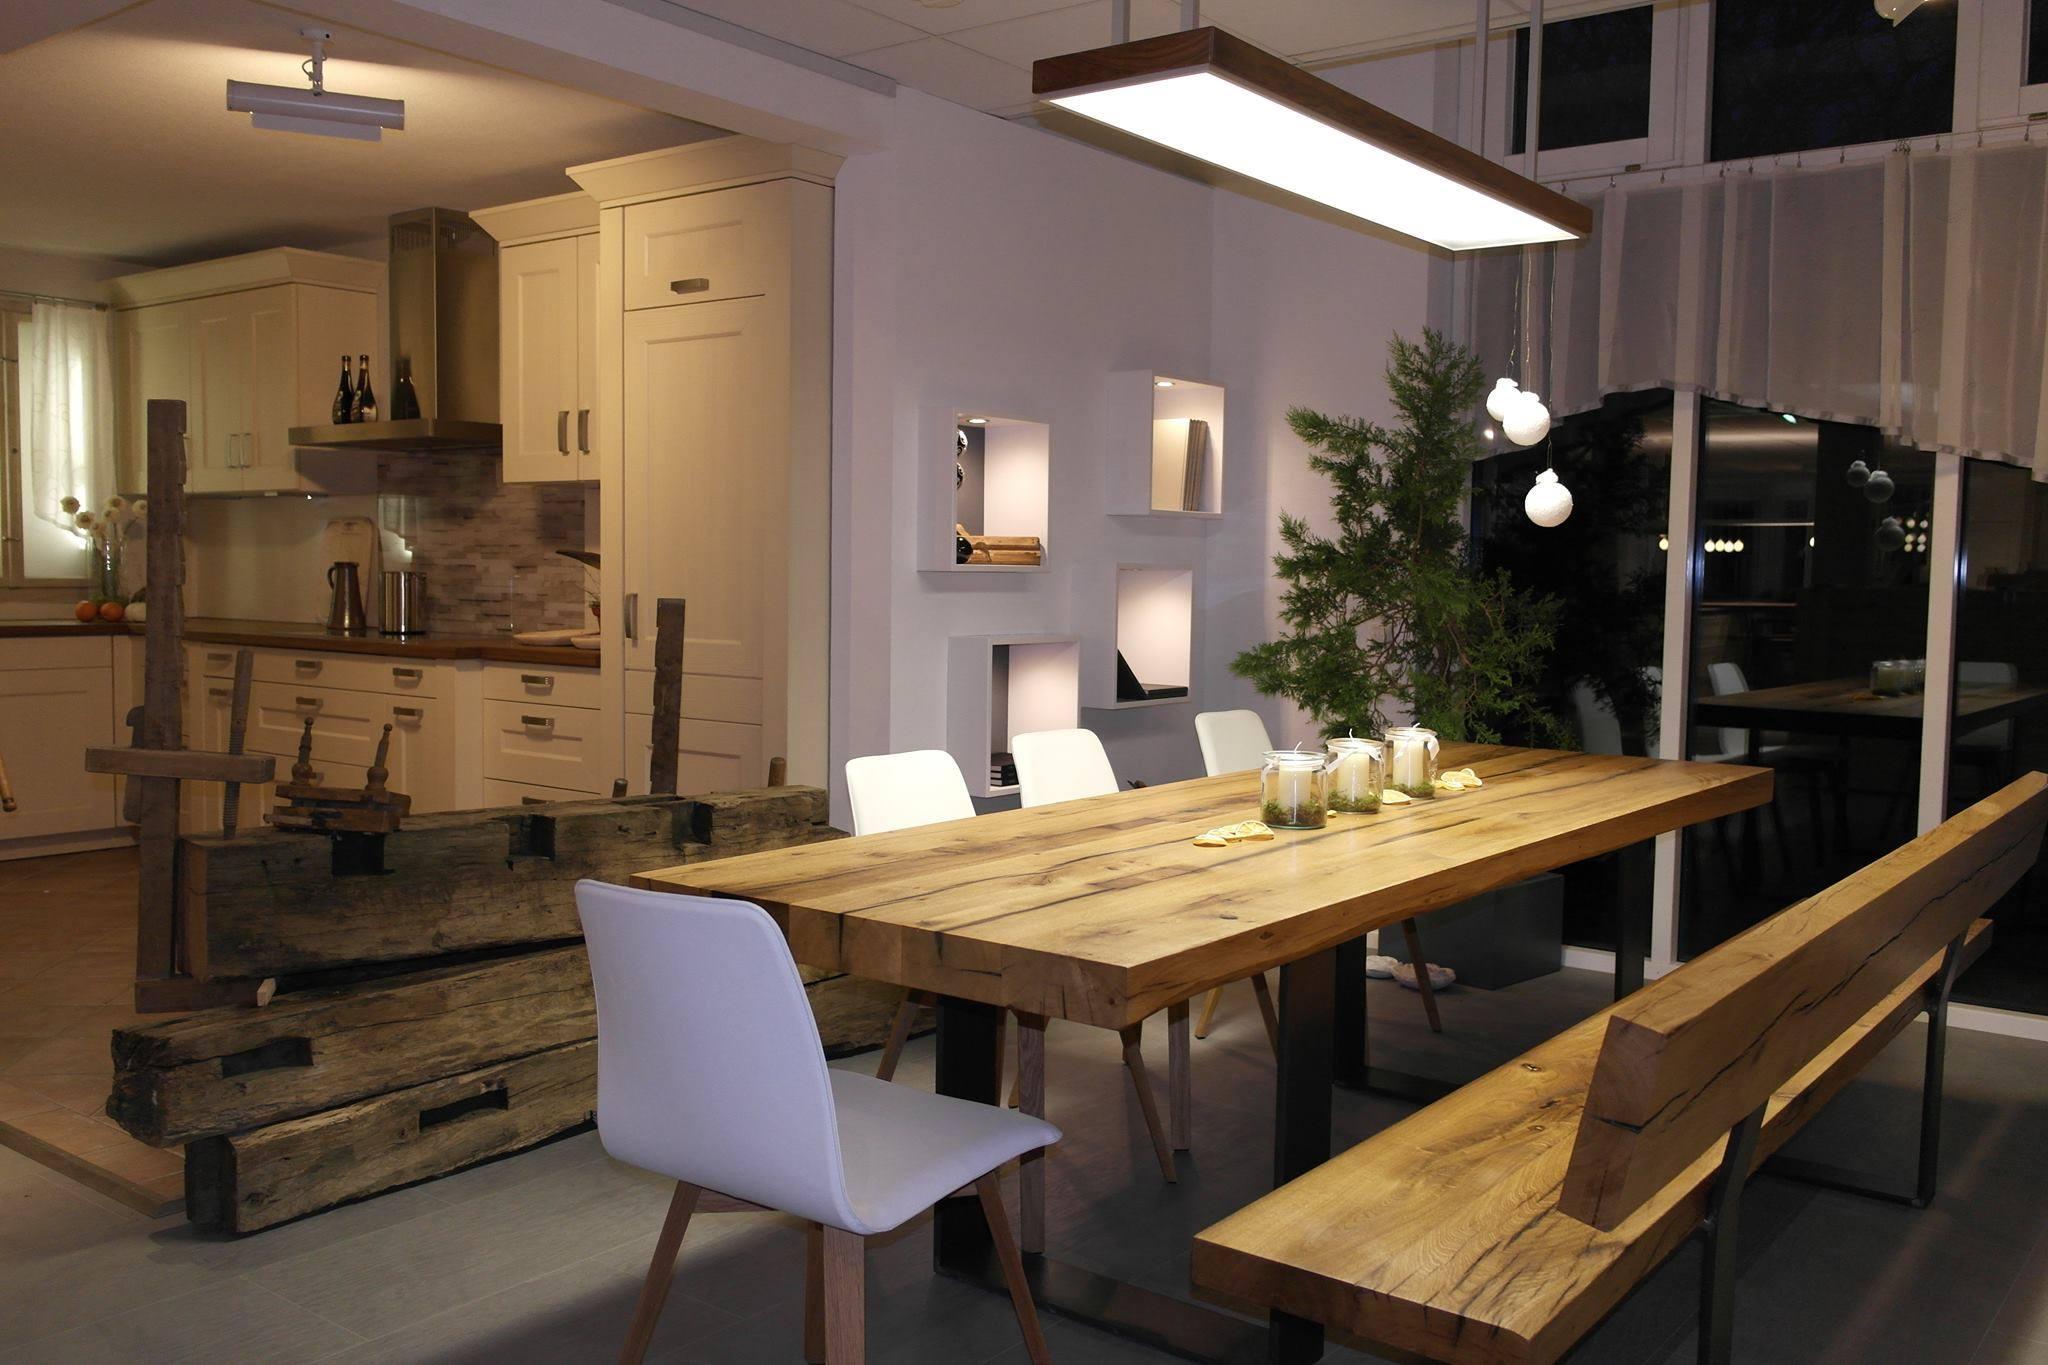 Schreinerei braig in allmendingen bei ulm for Table de salle a manger bois massif